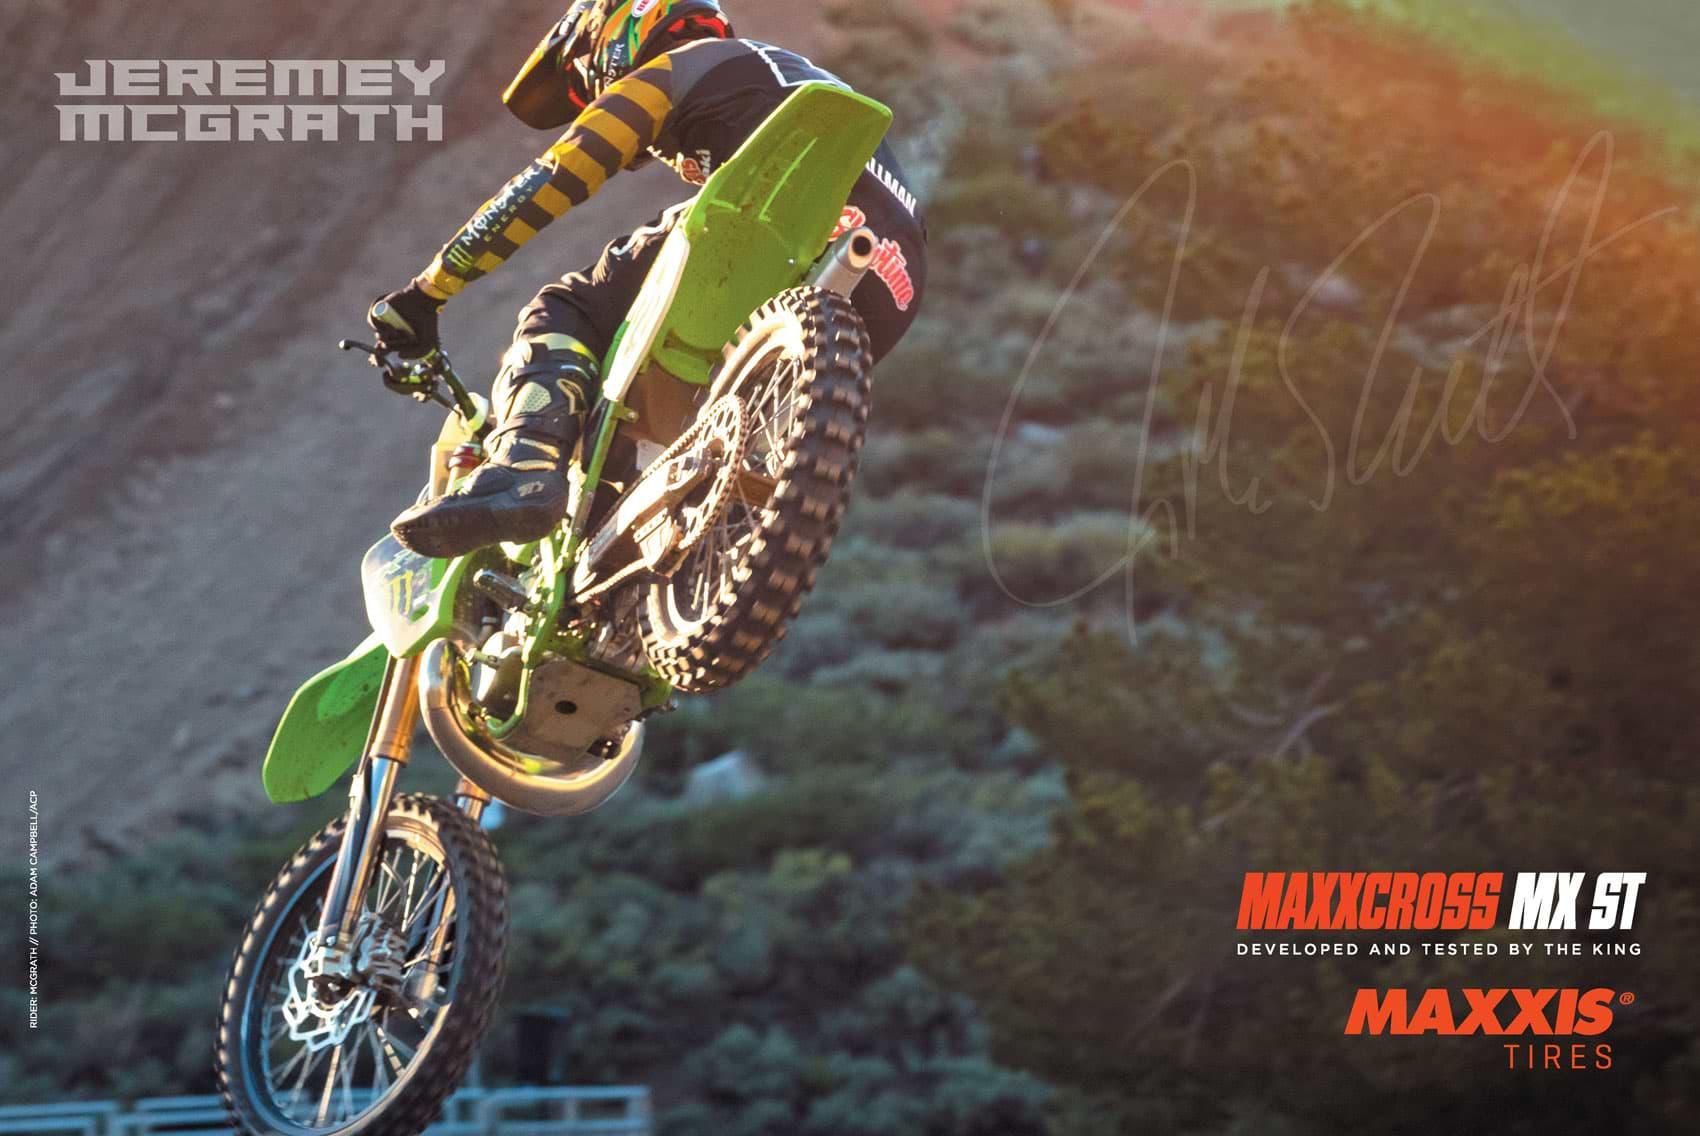 Racer X October 2019 - Maxxis Tires Advertisement